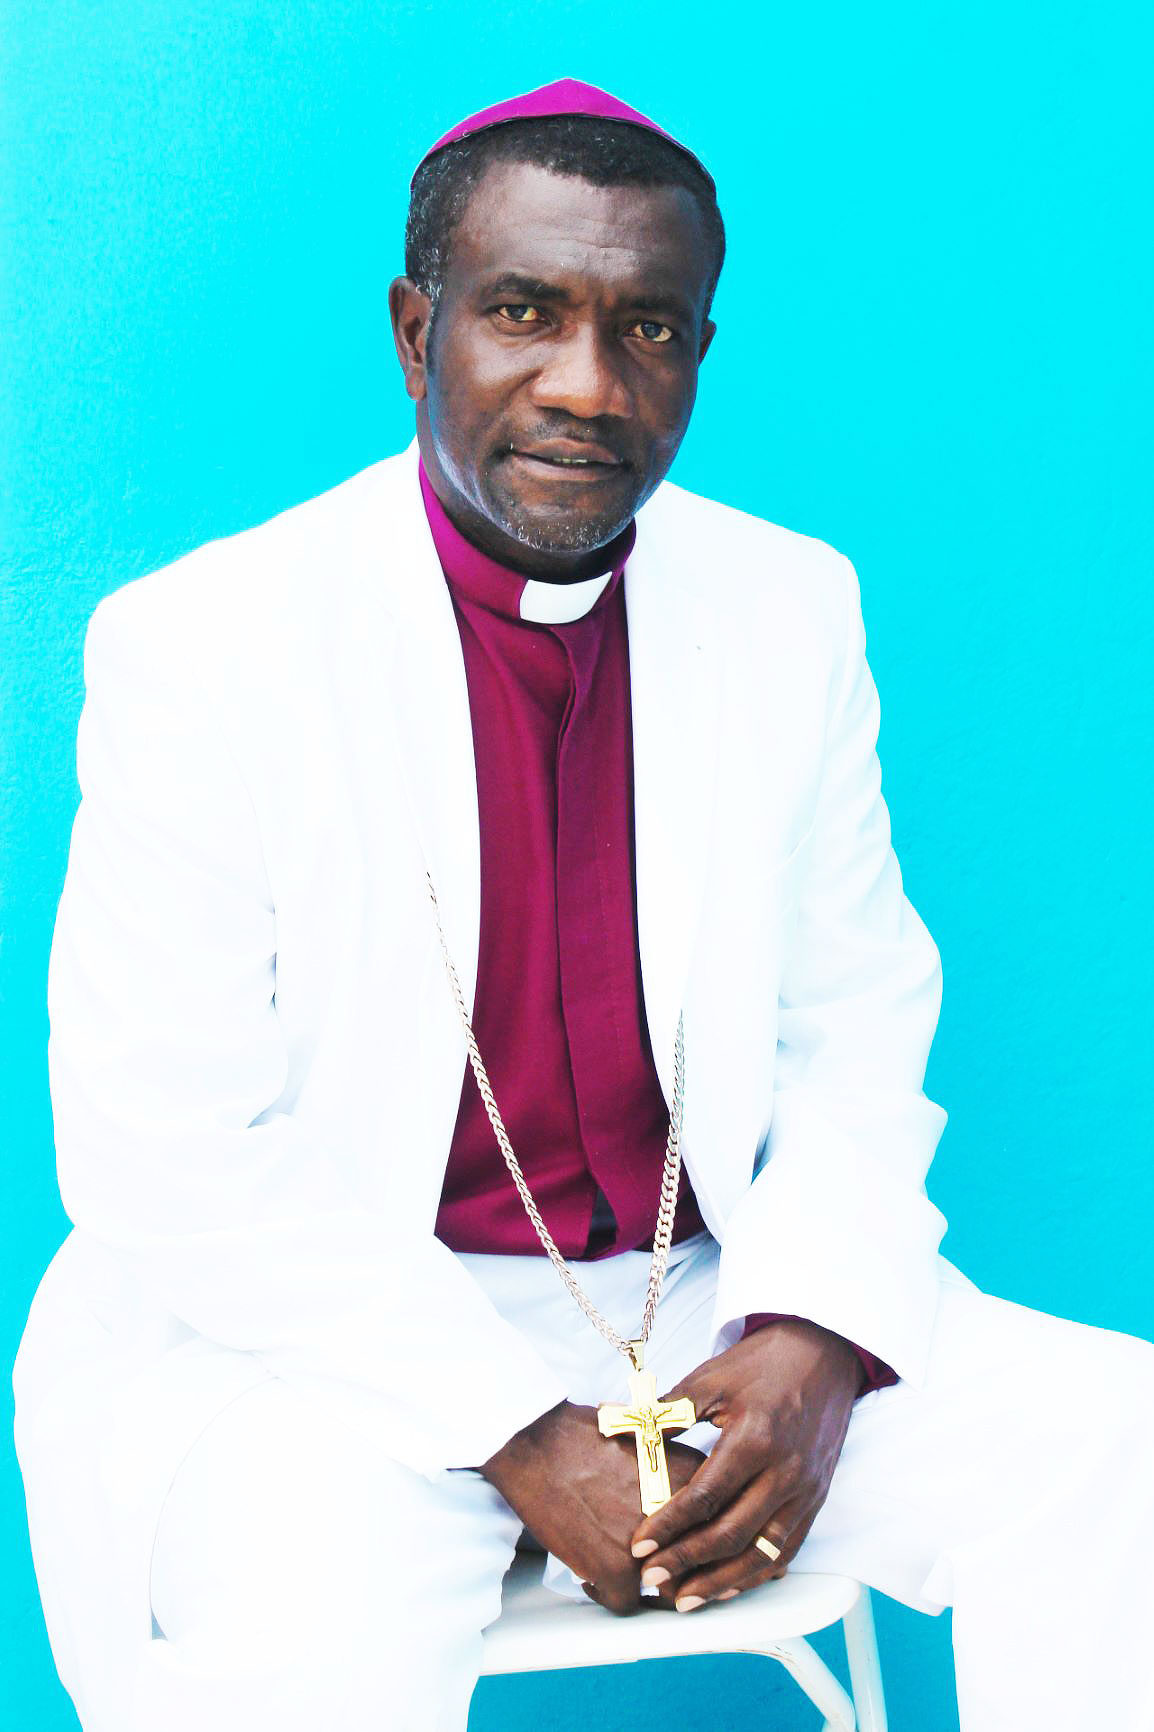 Bischof Brodby